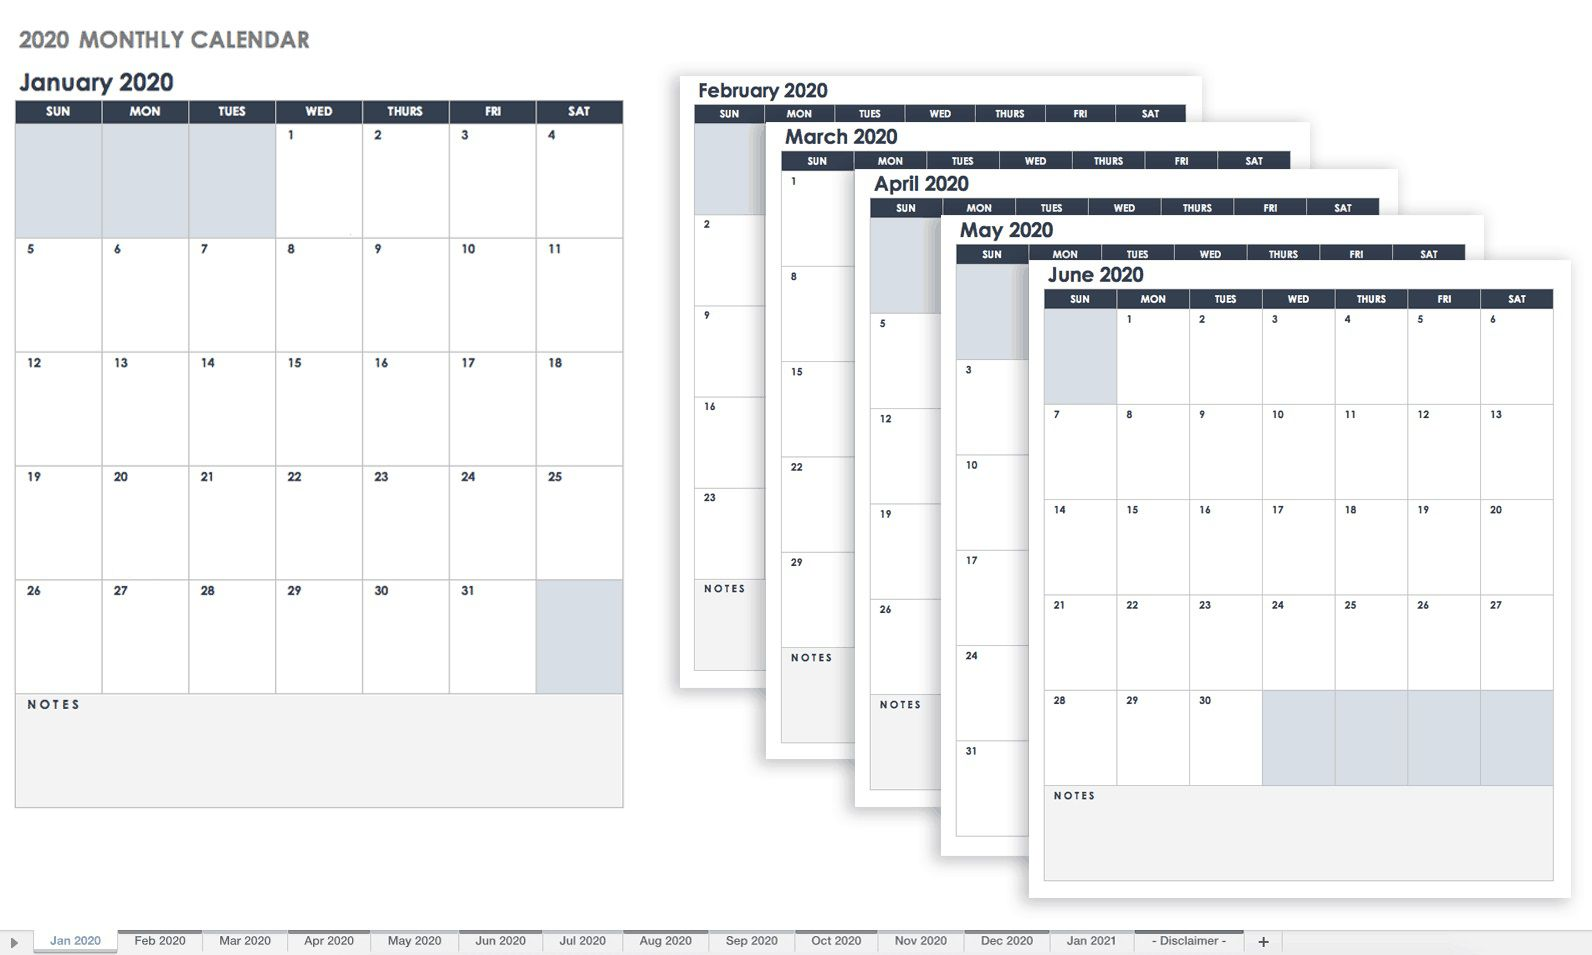 005 Impressive Calendar Template Google Doc High Resolution  Docs Editable Two Week 2019-20Full